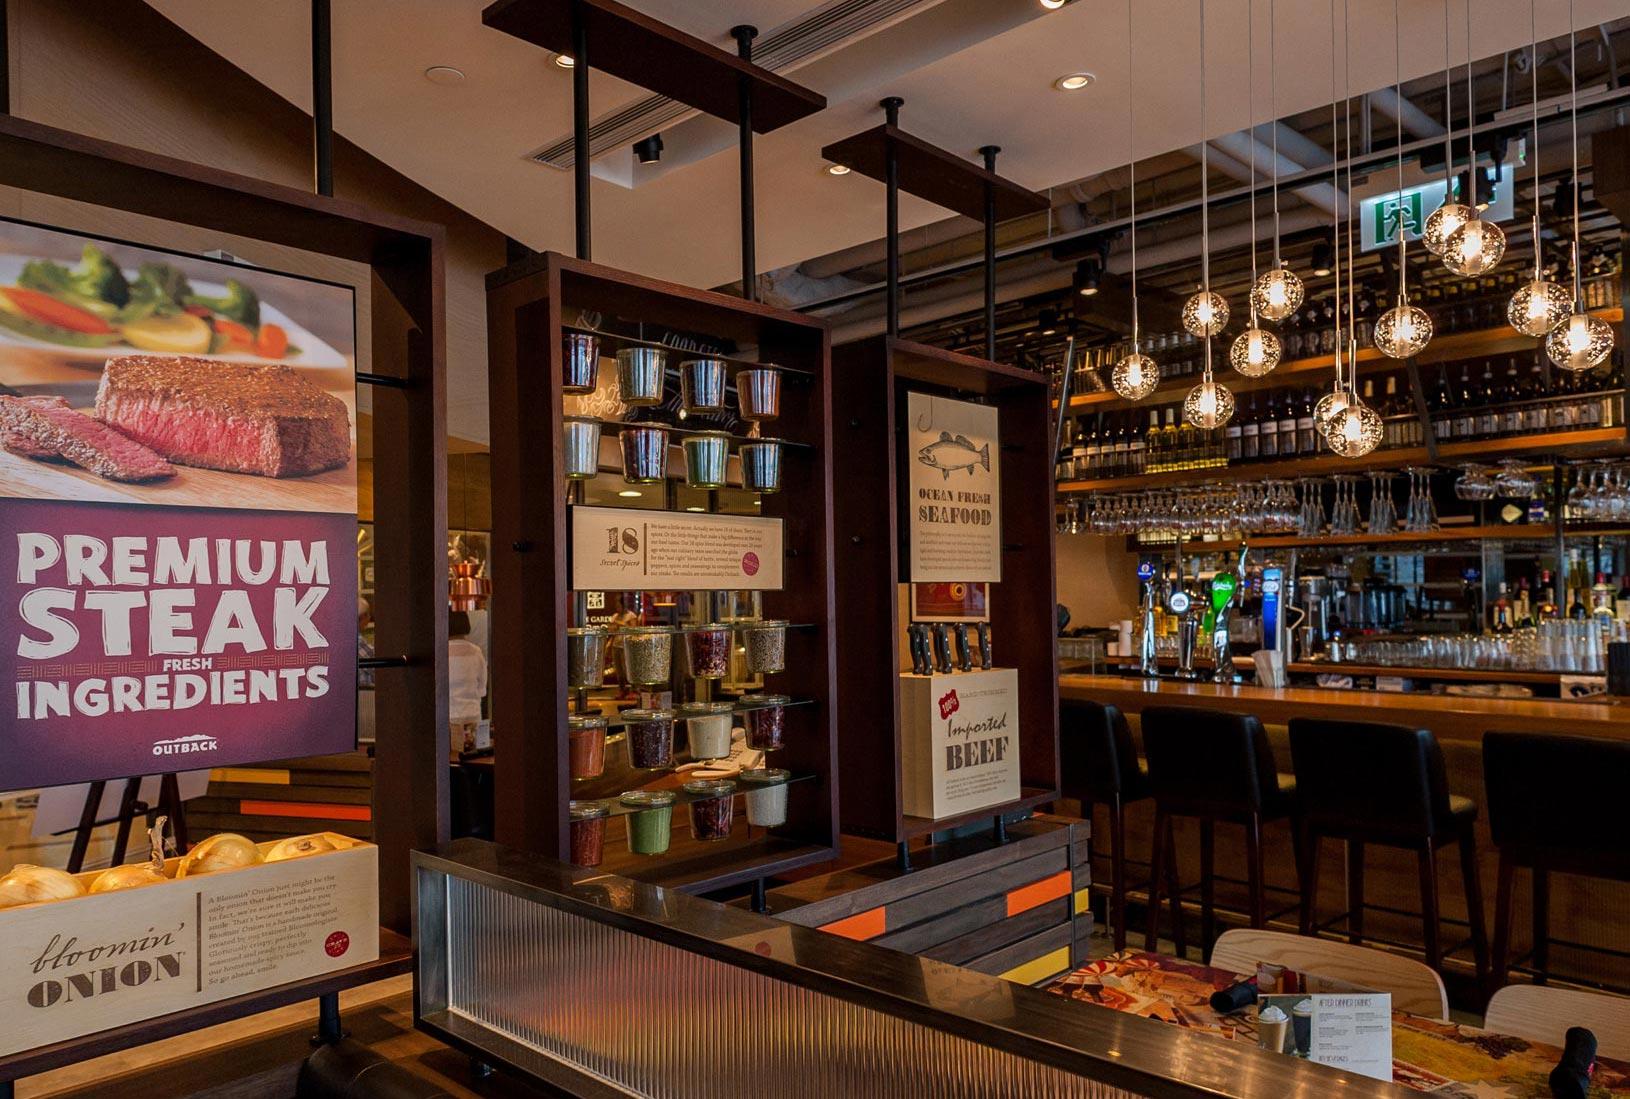 Us International Restaurant Franchise Opportunities Bloomin Brands